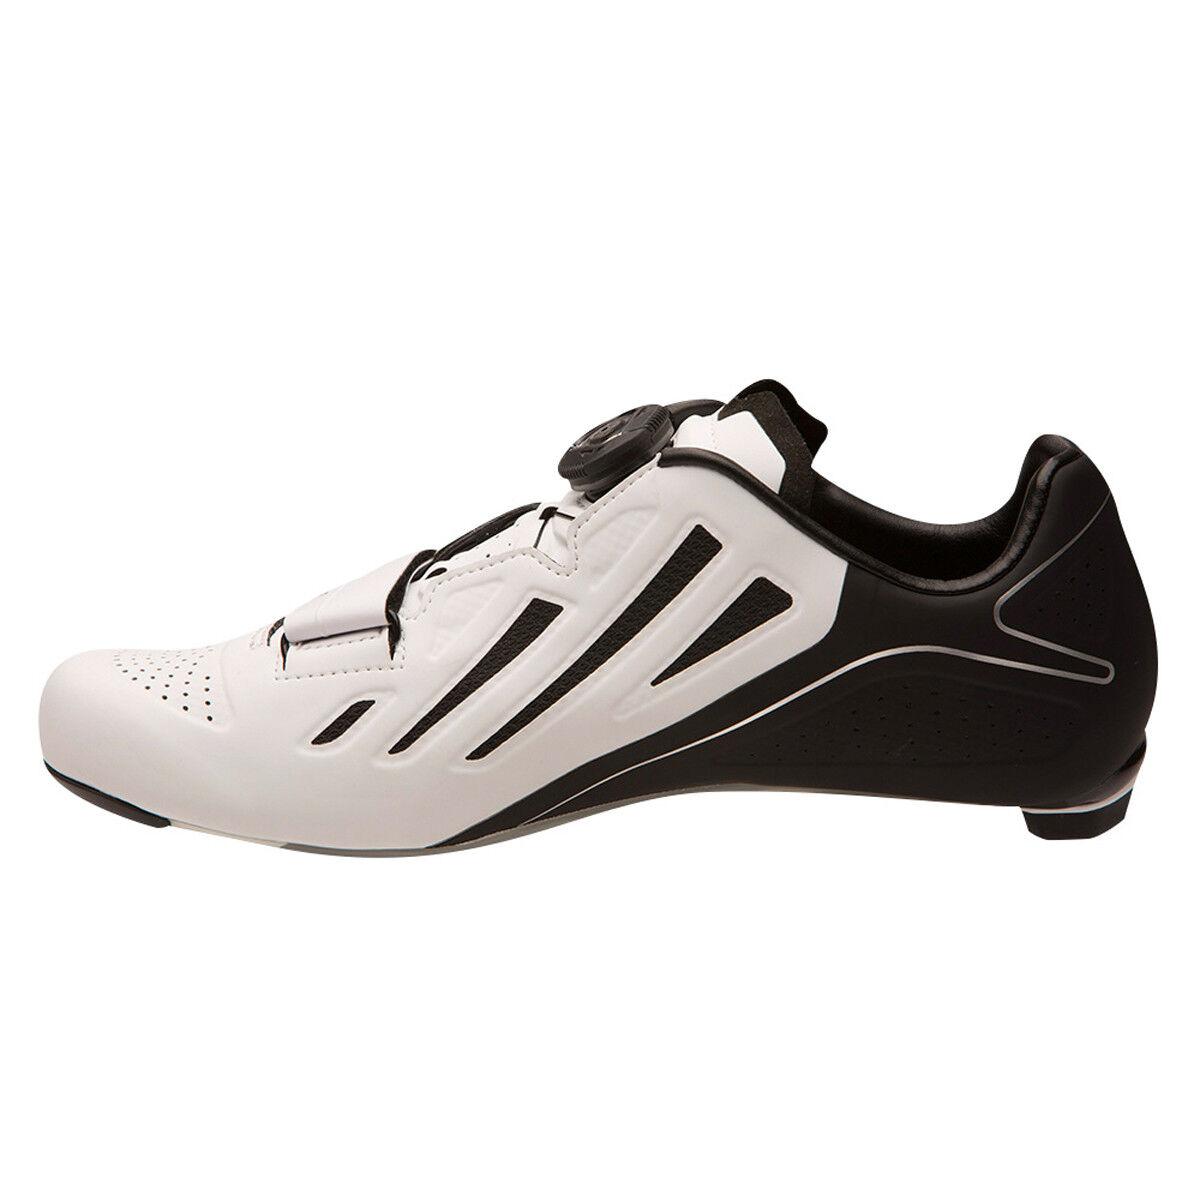 Pearl Izumi Elite Road V5 V5 Road Damen Rennrad Fahrrad Schuhe weiß/schwarz 2017 77c9bc